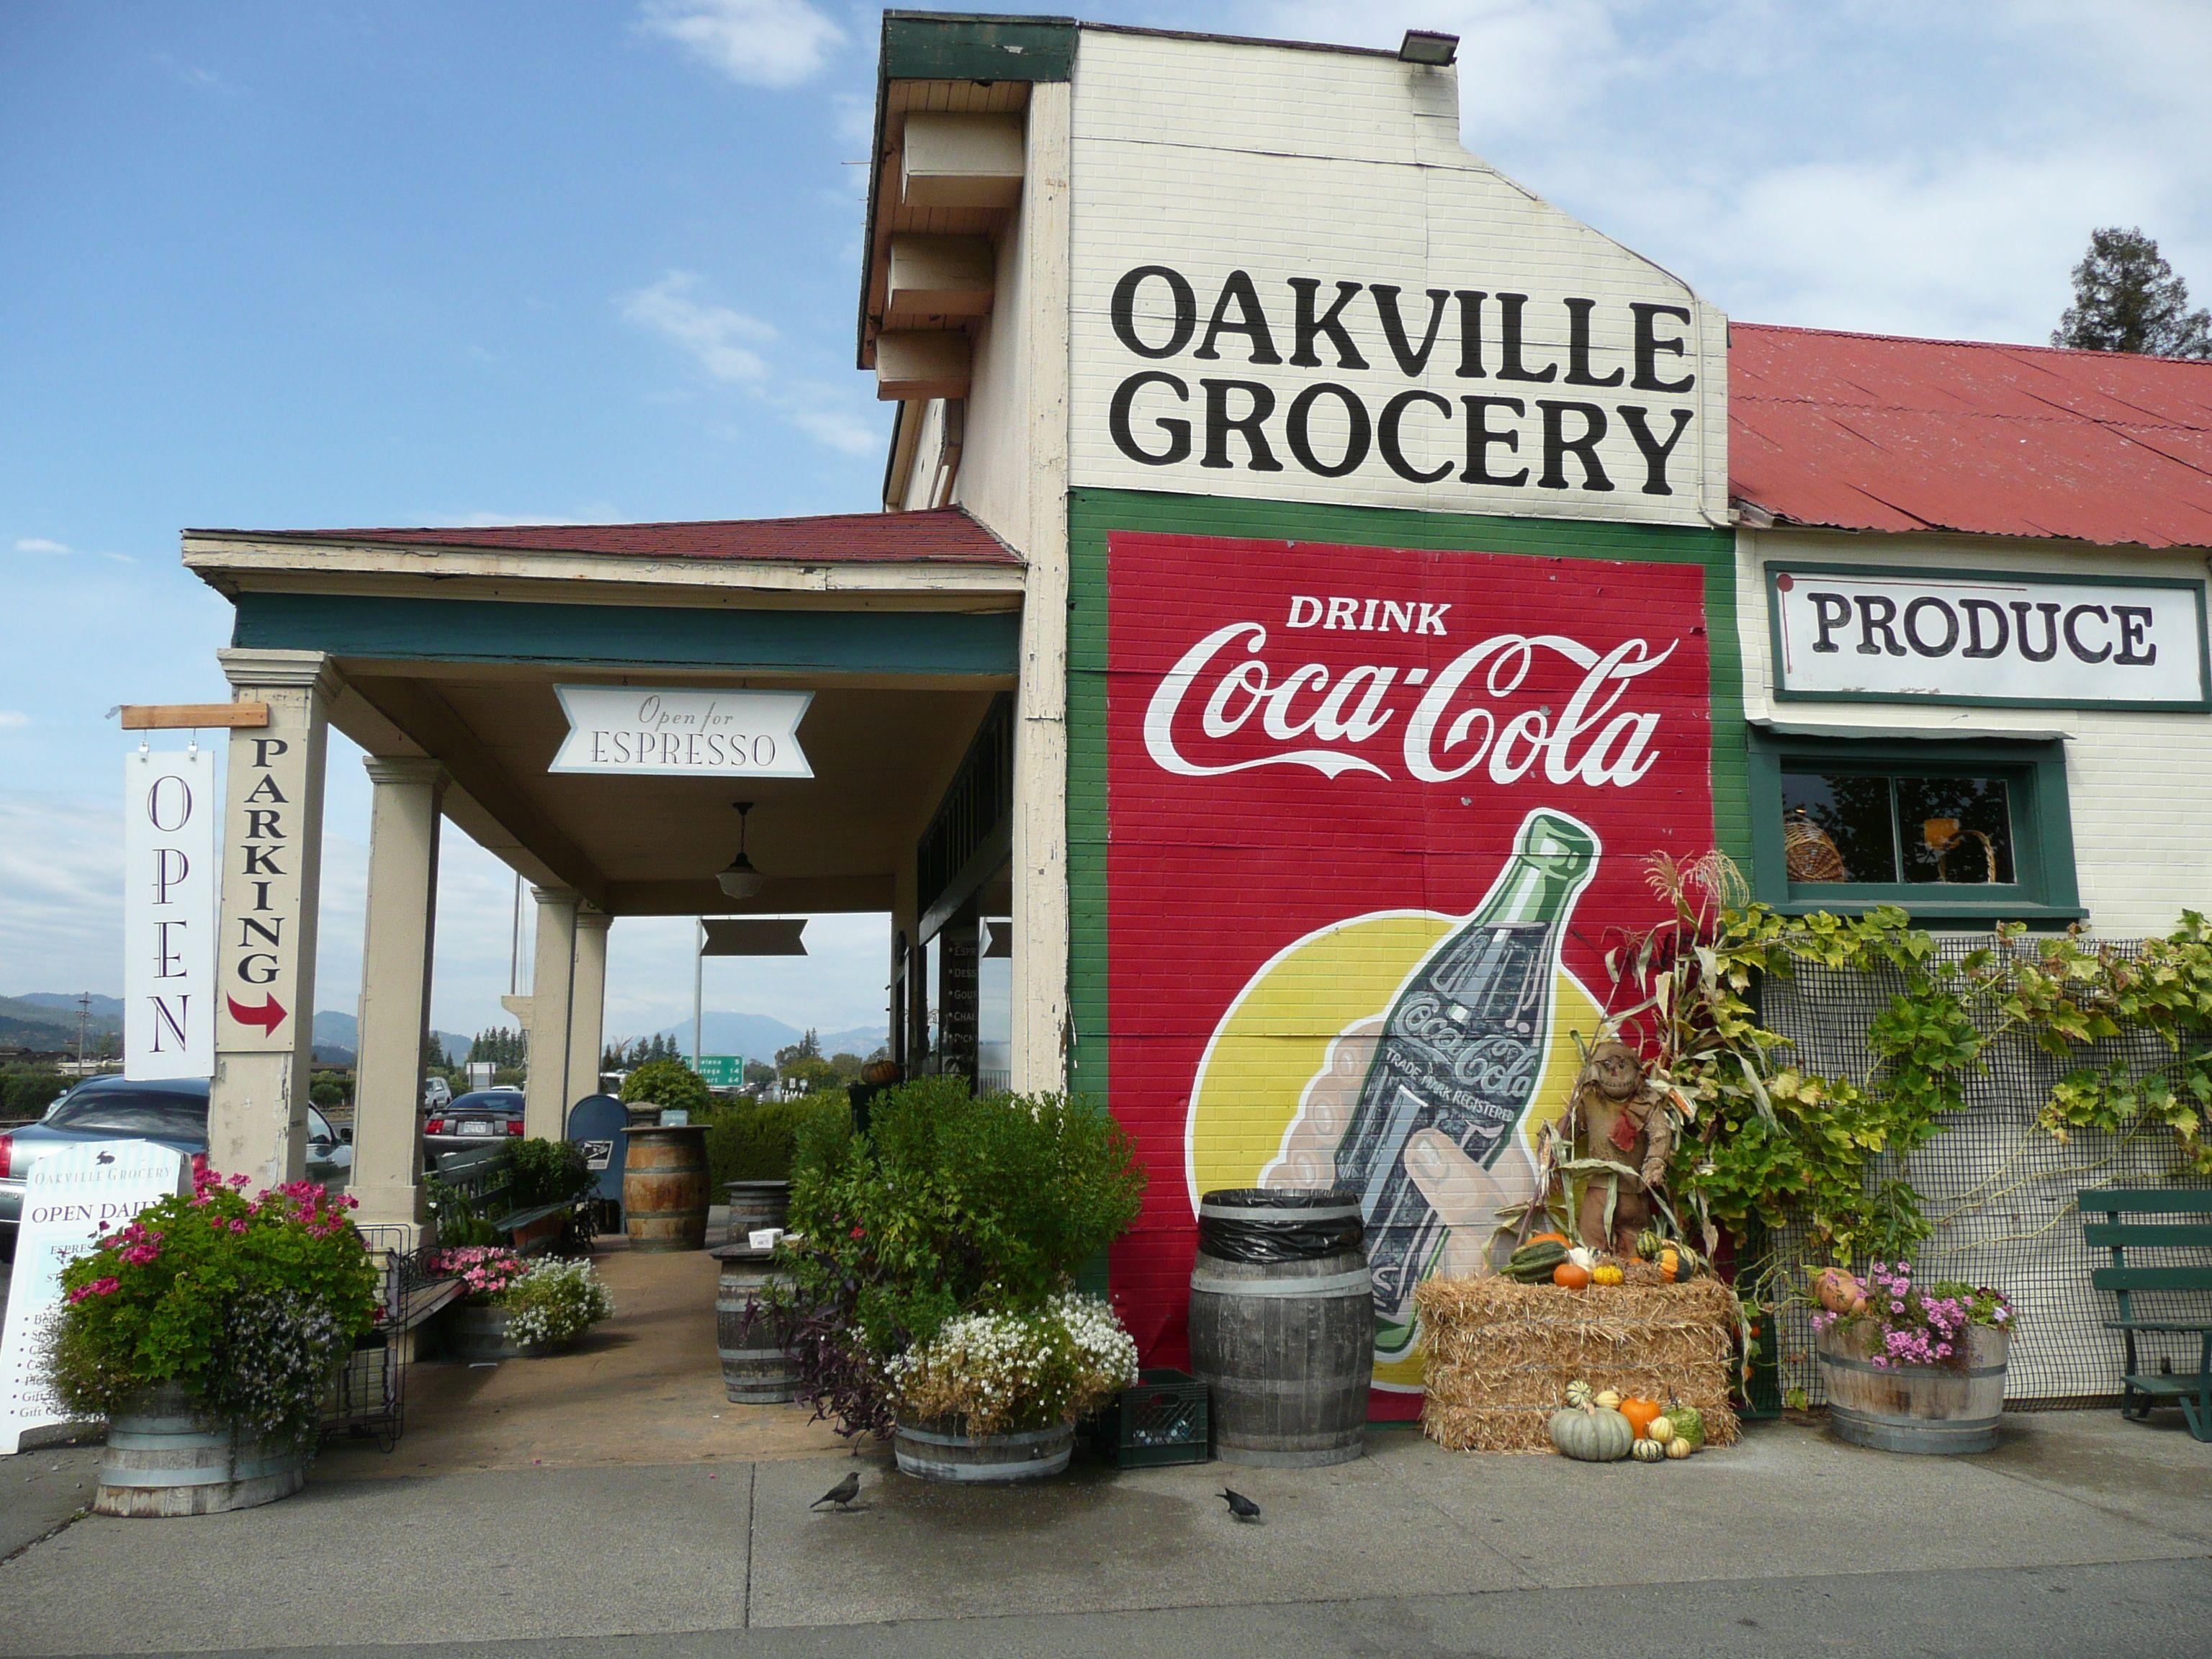 Oakville Grocery Napa Valley California Oakville Grocery Napa Valley Trip Wine Country California